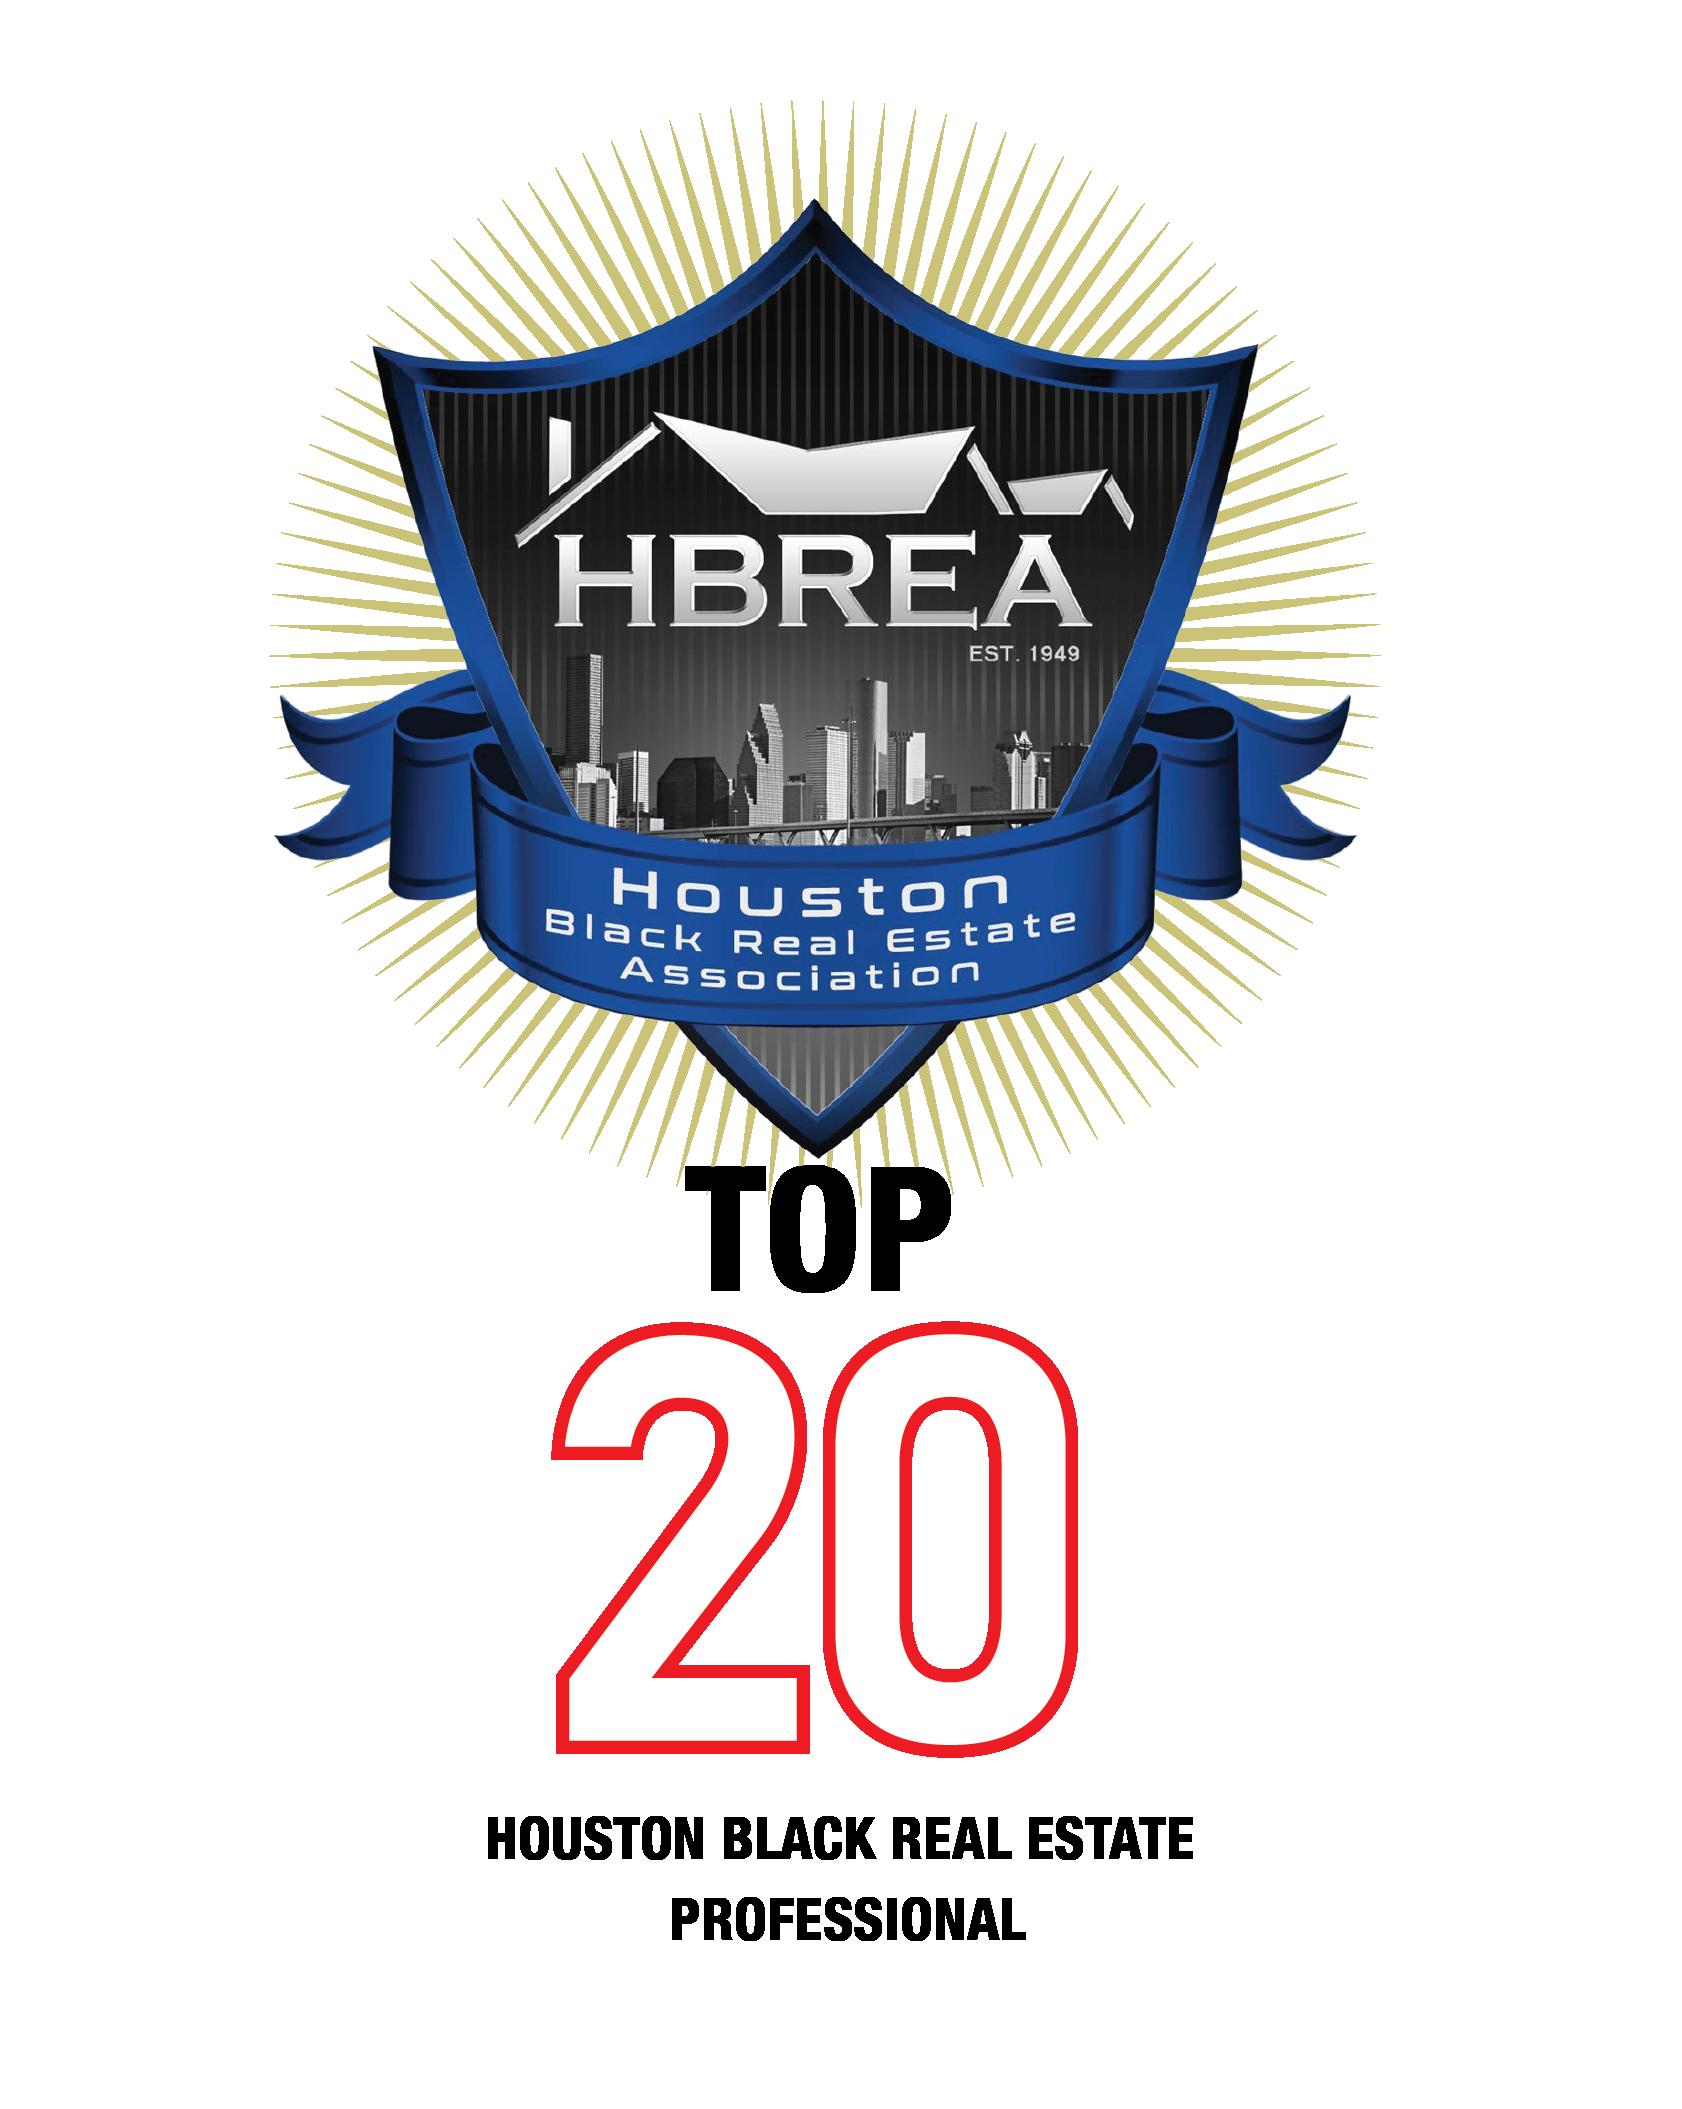 HBREA TOP 20 Award Application Form